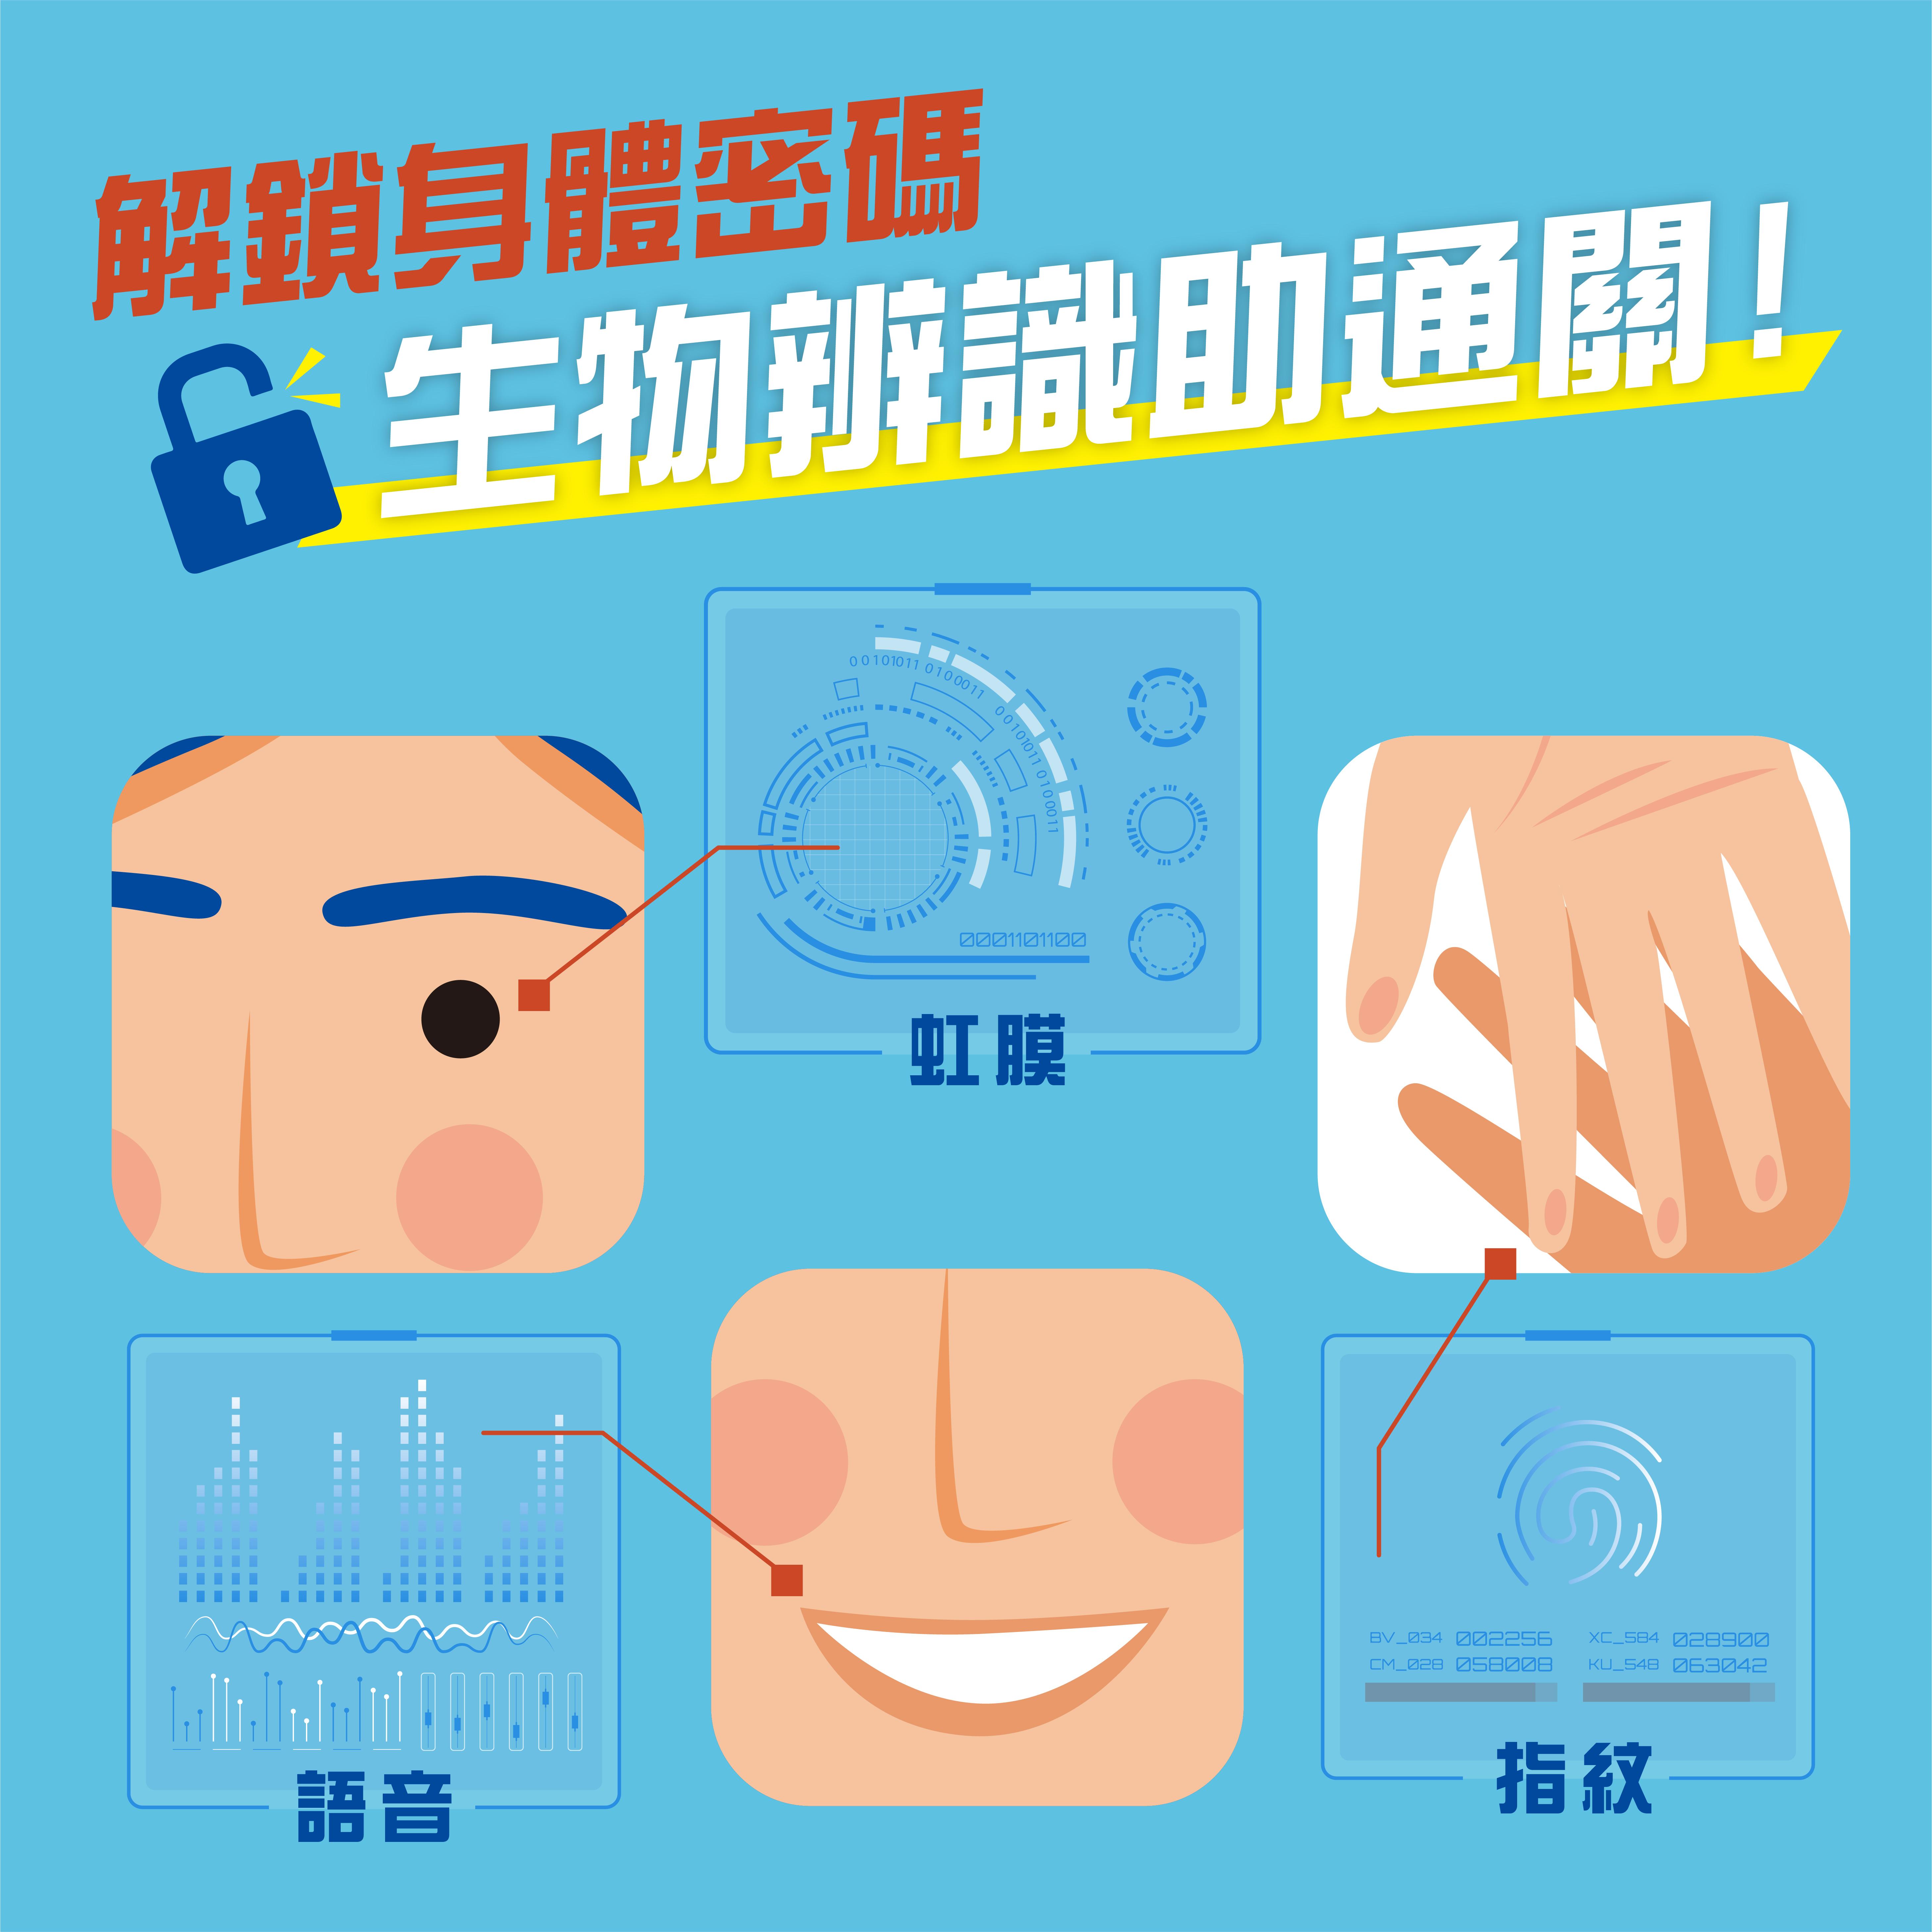 EP 22 【產業尋寶】解鎖身體密碼 生物辨識助通關